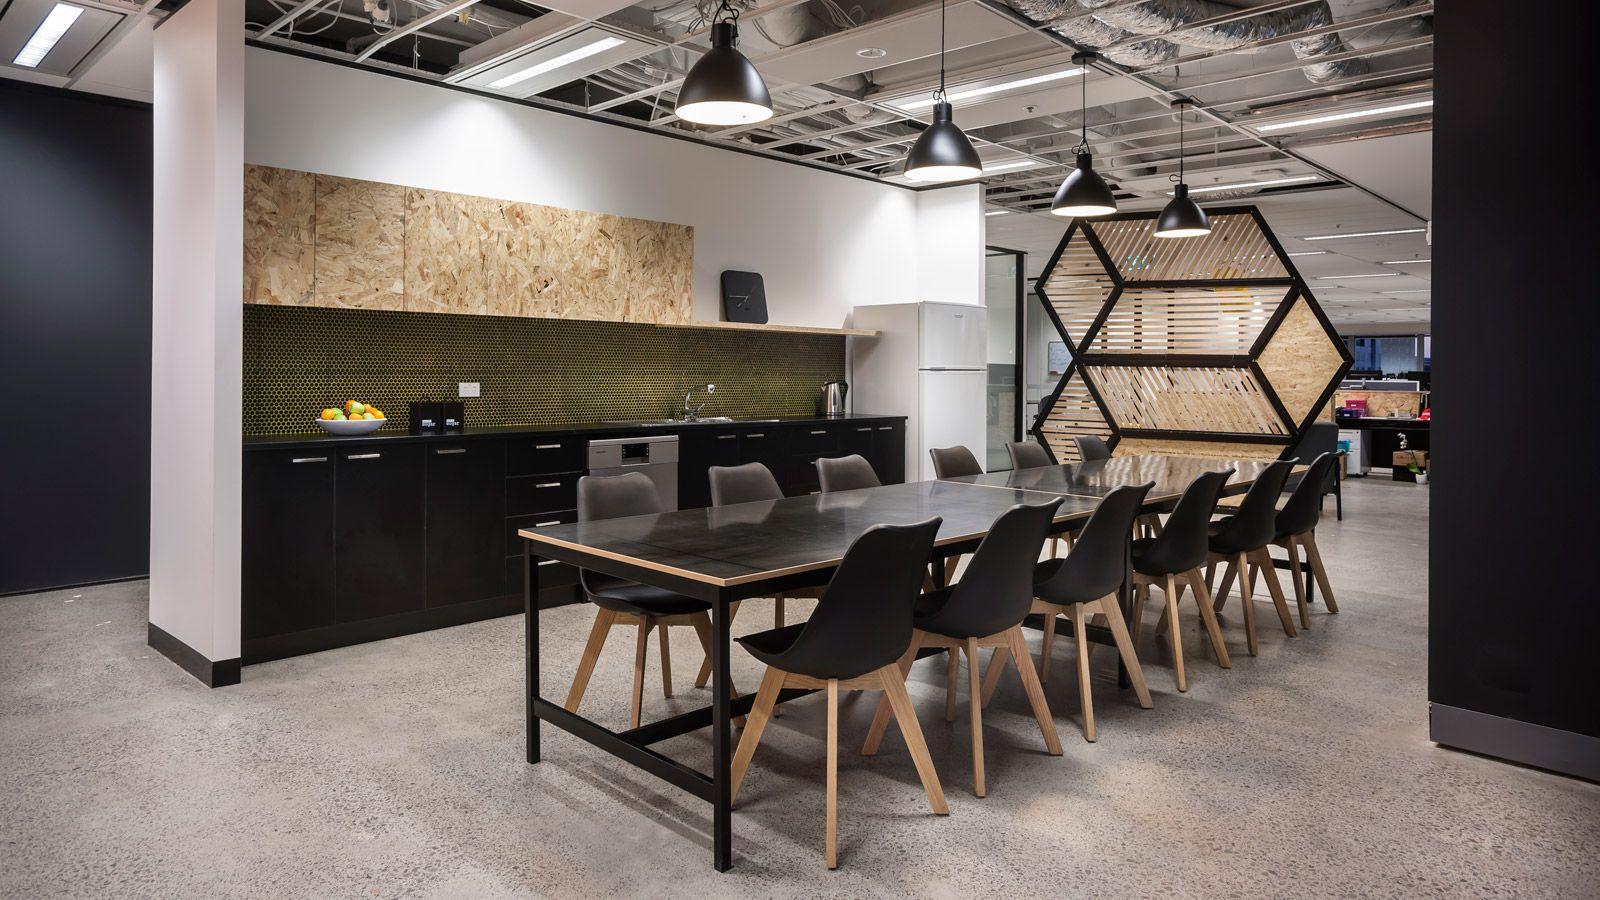 commercial office fitouts reception lunchroom boardroom fitout office refurbishment espace de bureau